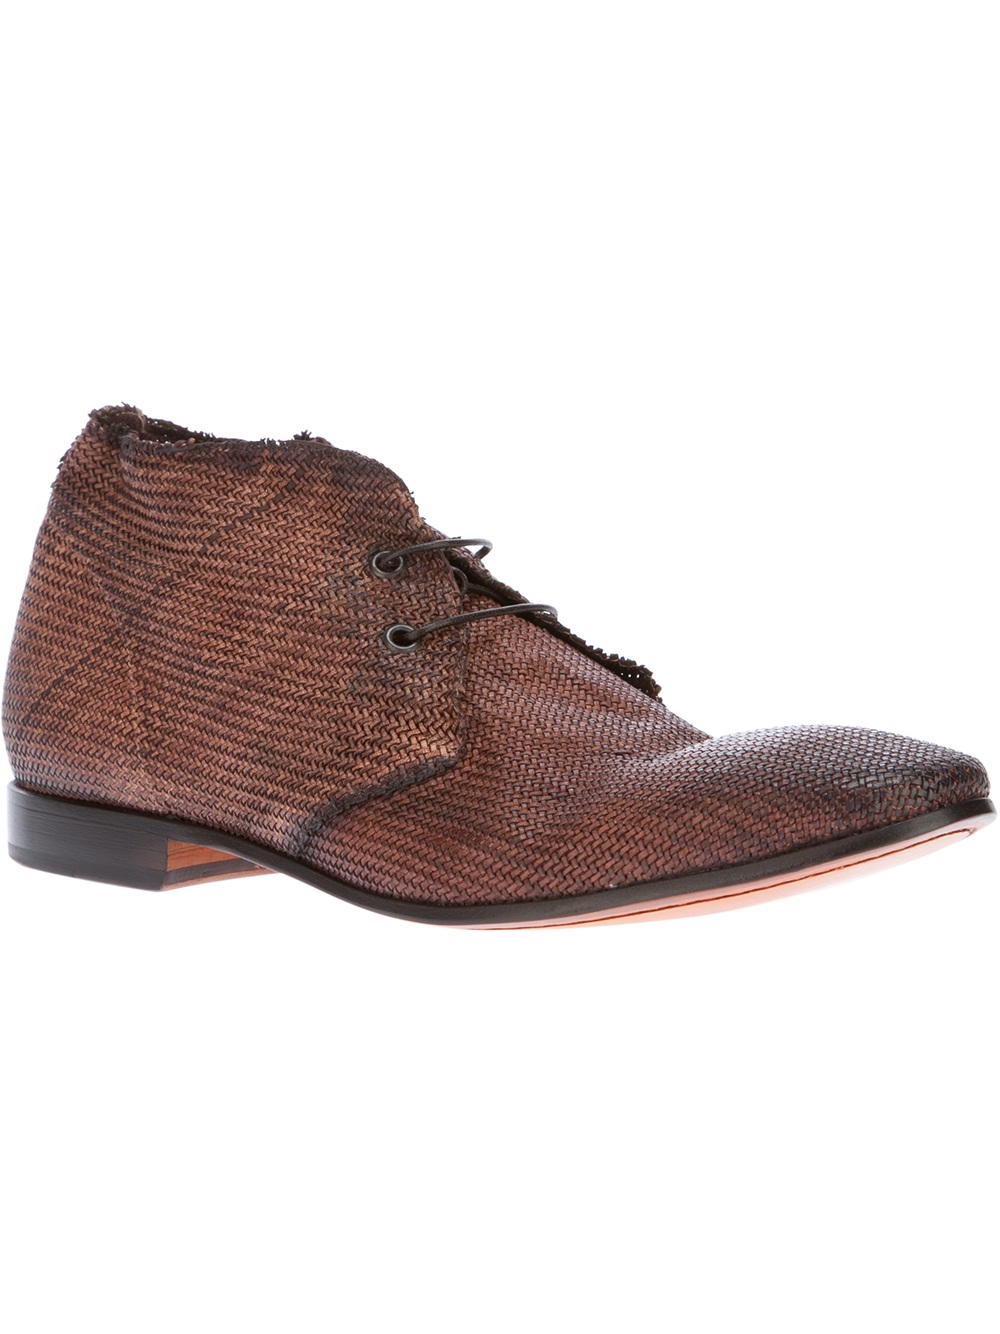 Emerica Shoes New York